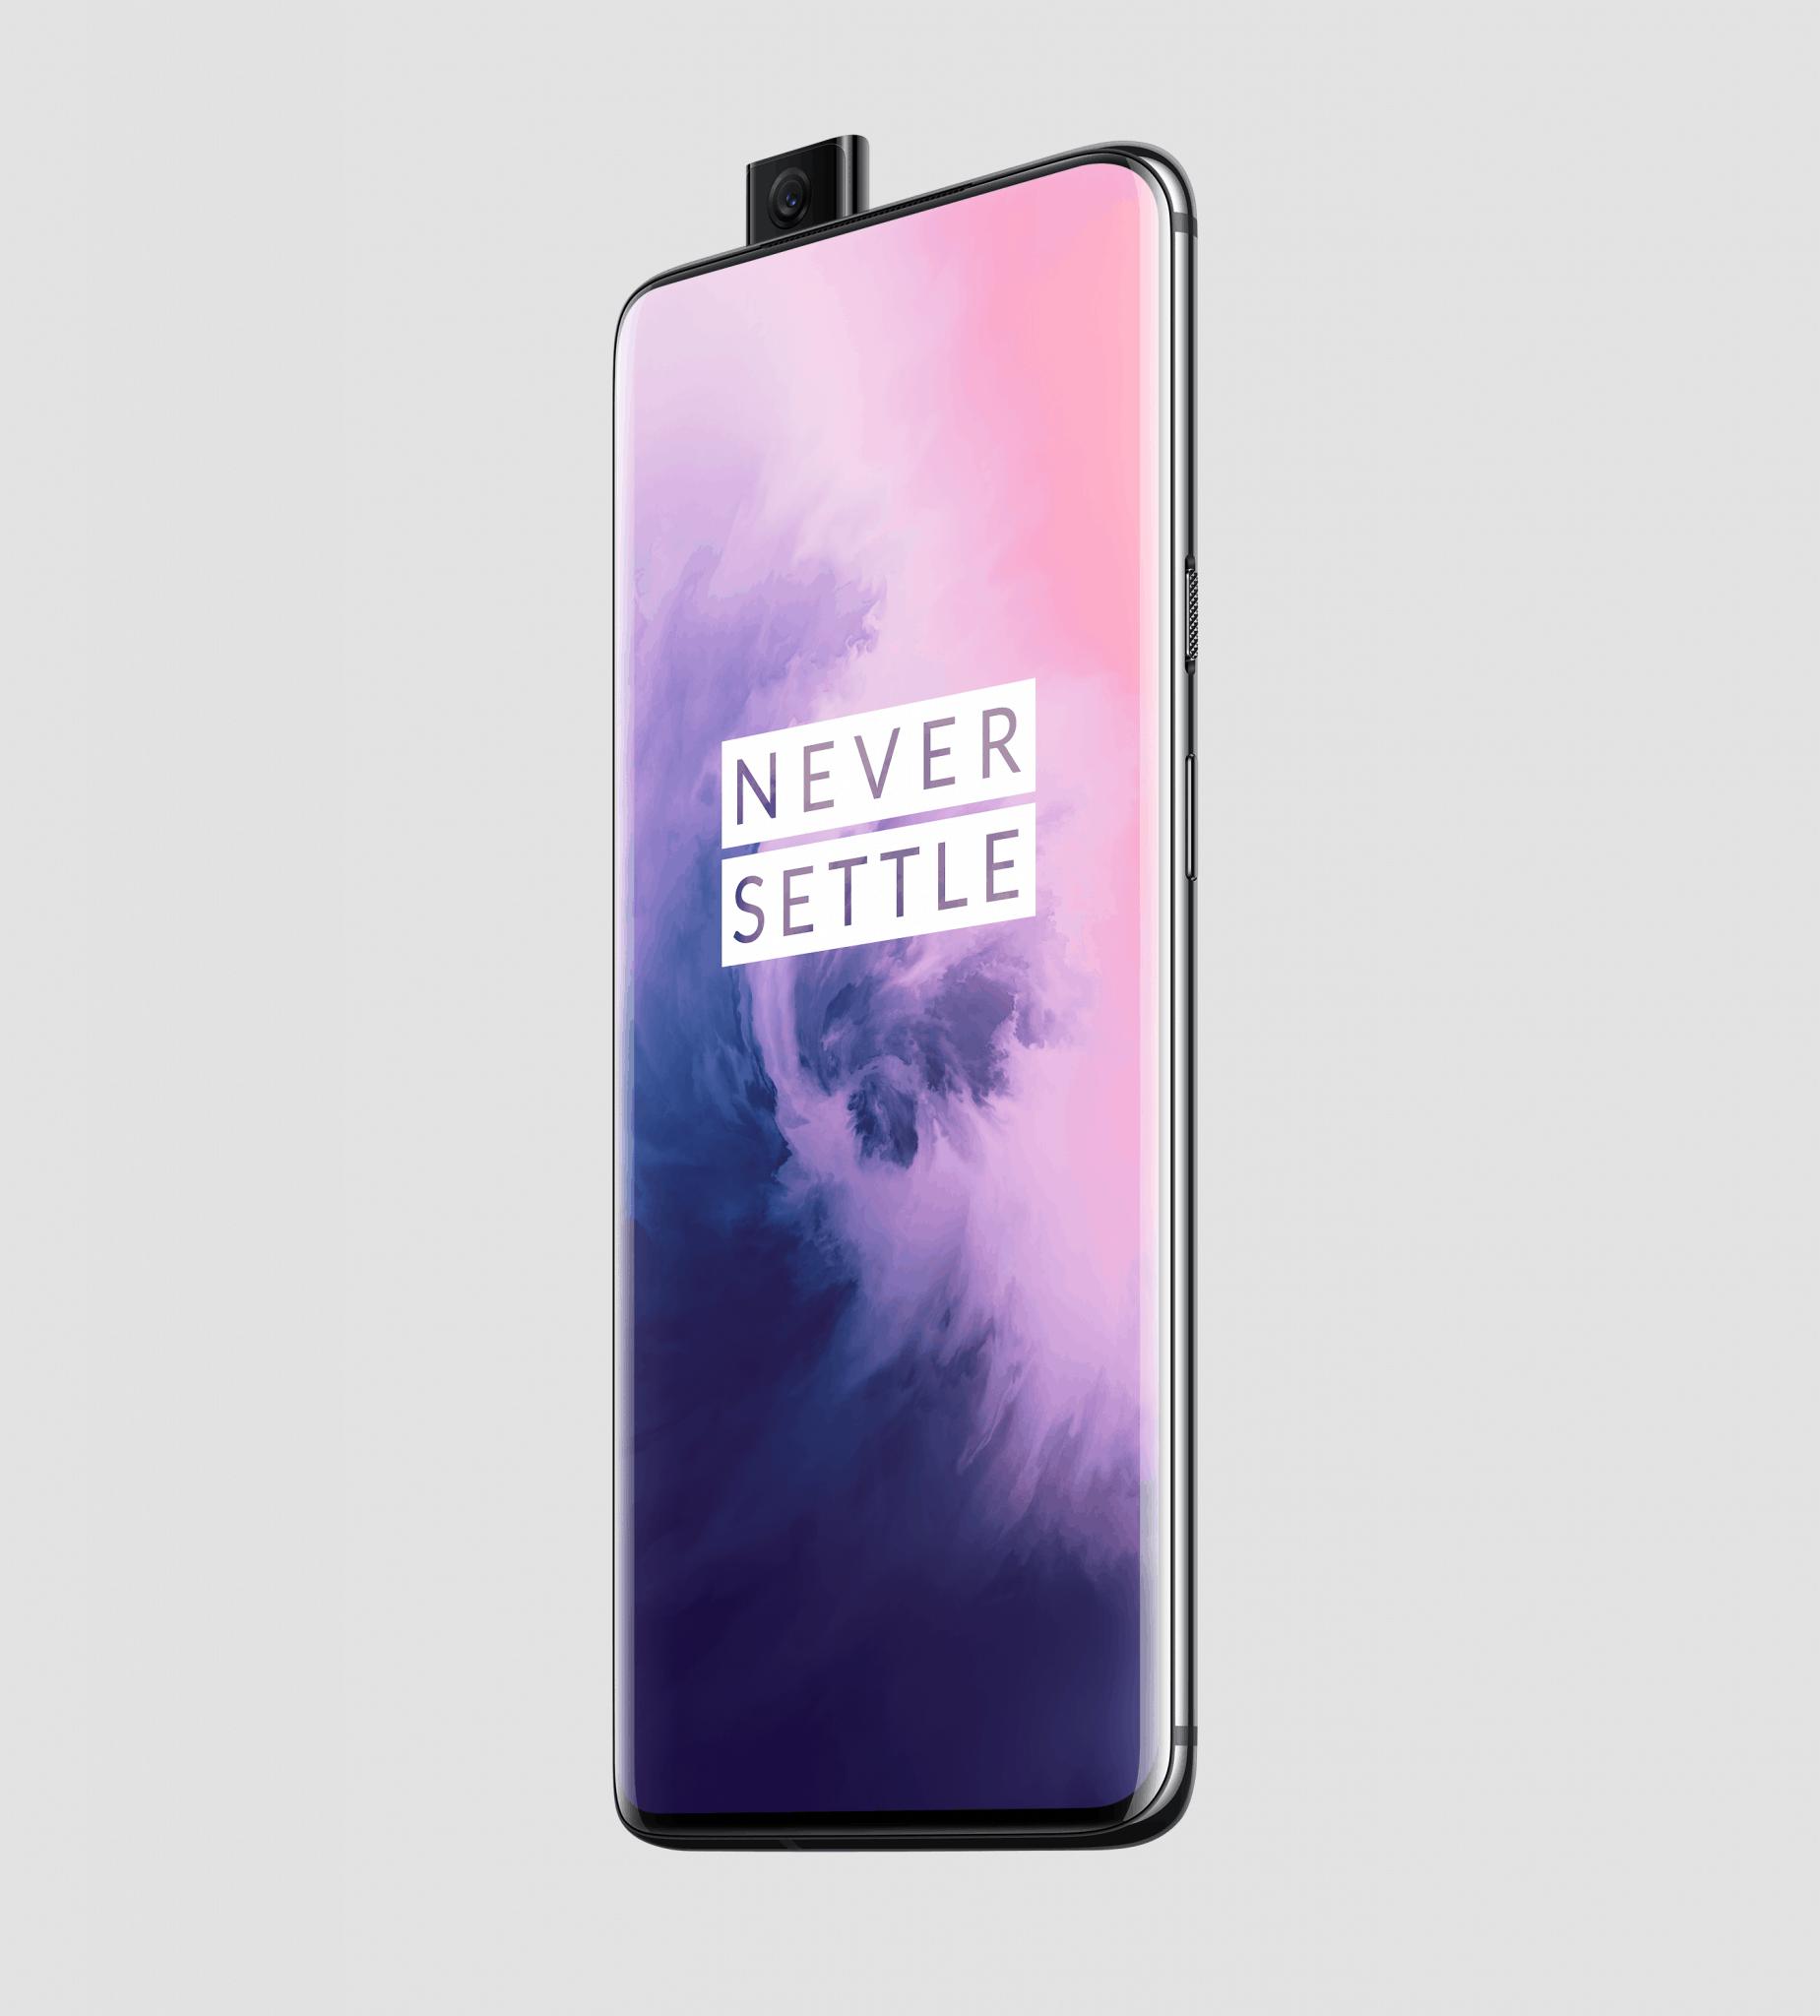 OnePlus 7 Pro - 5